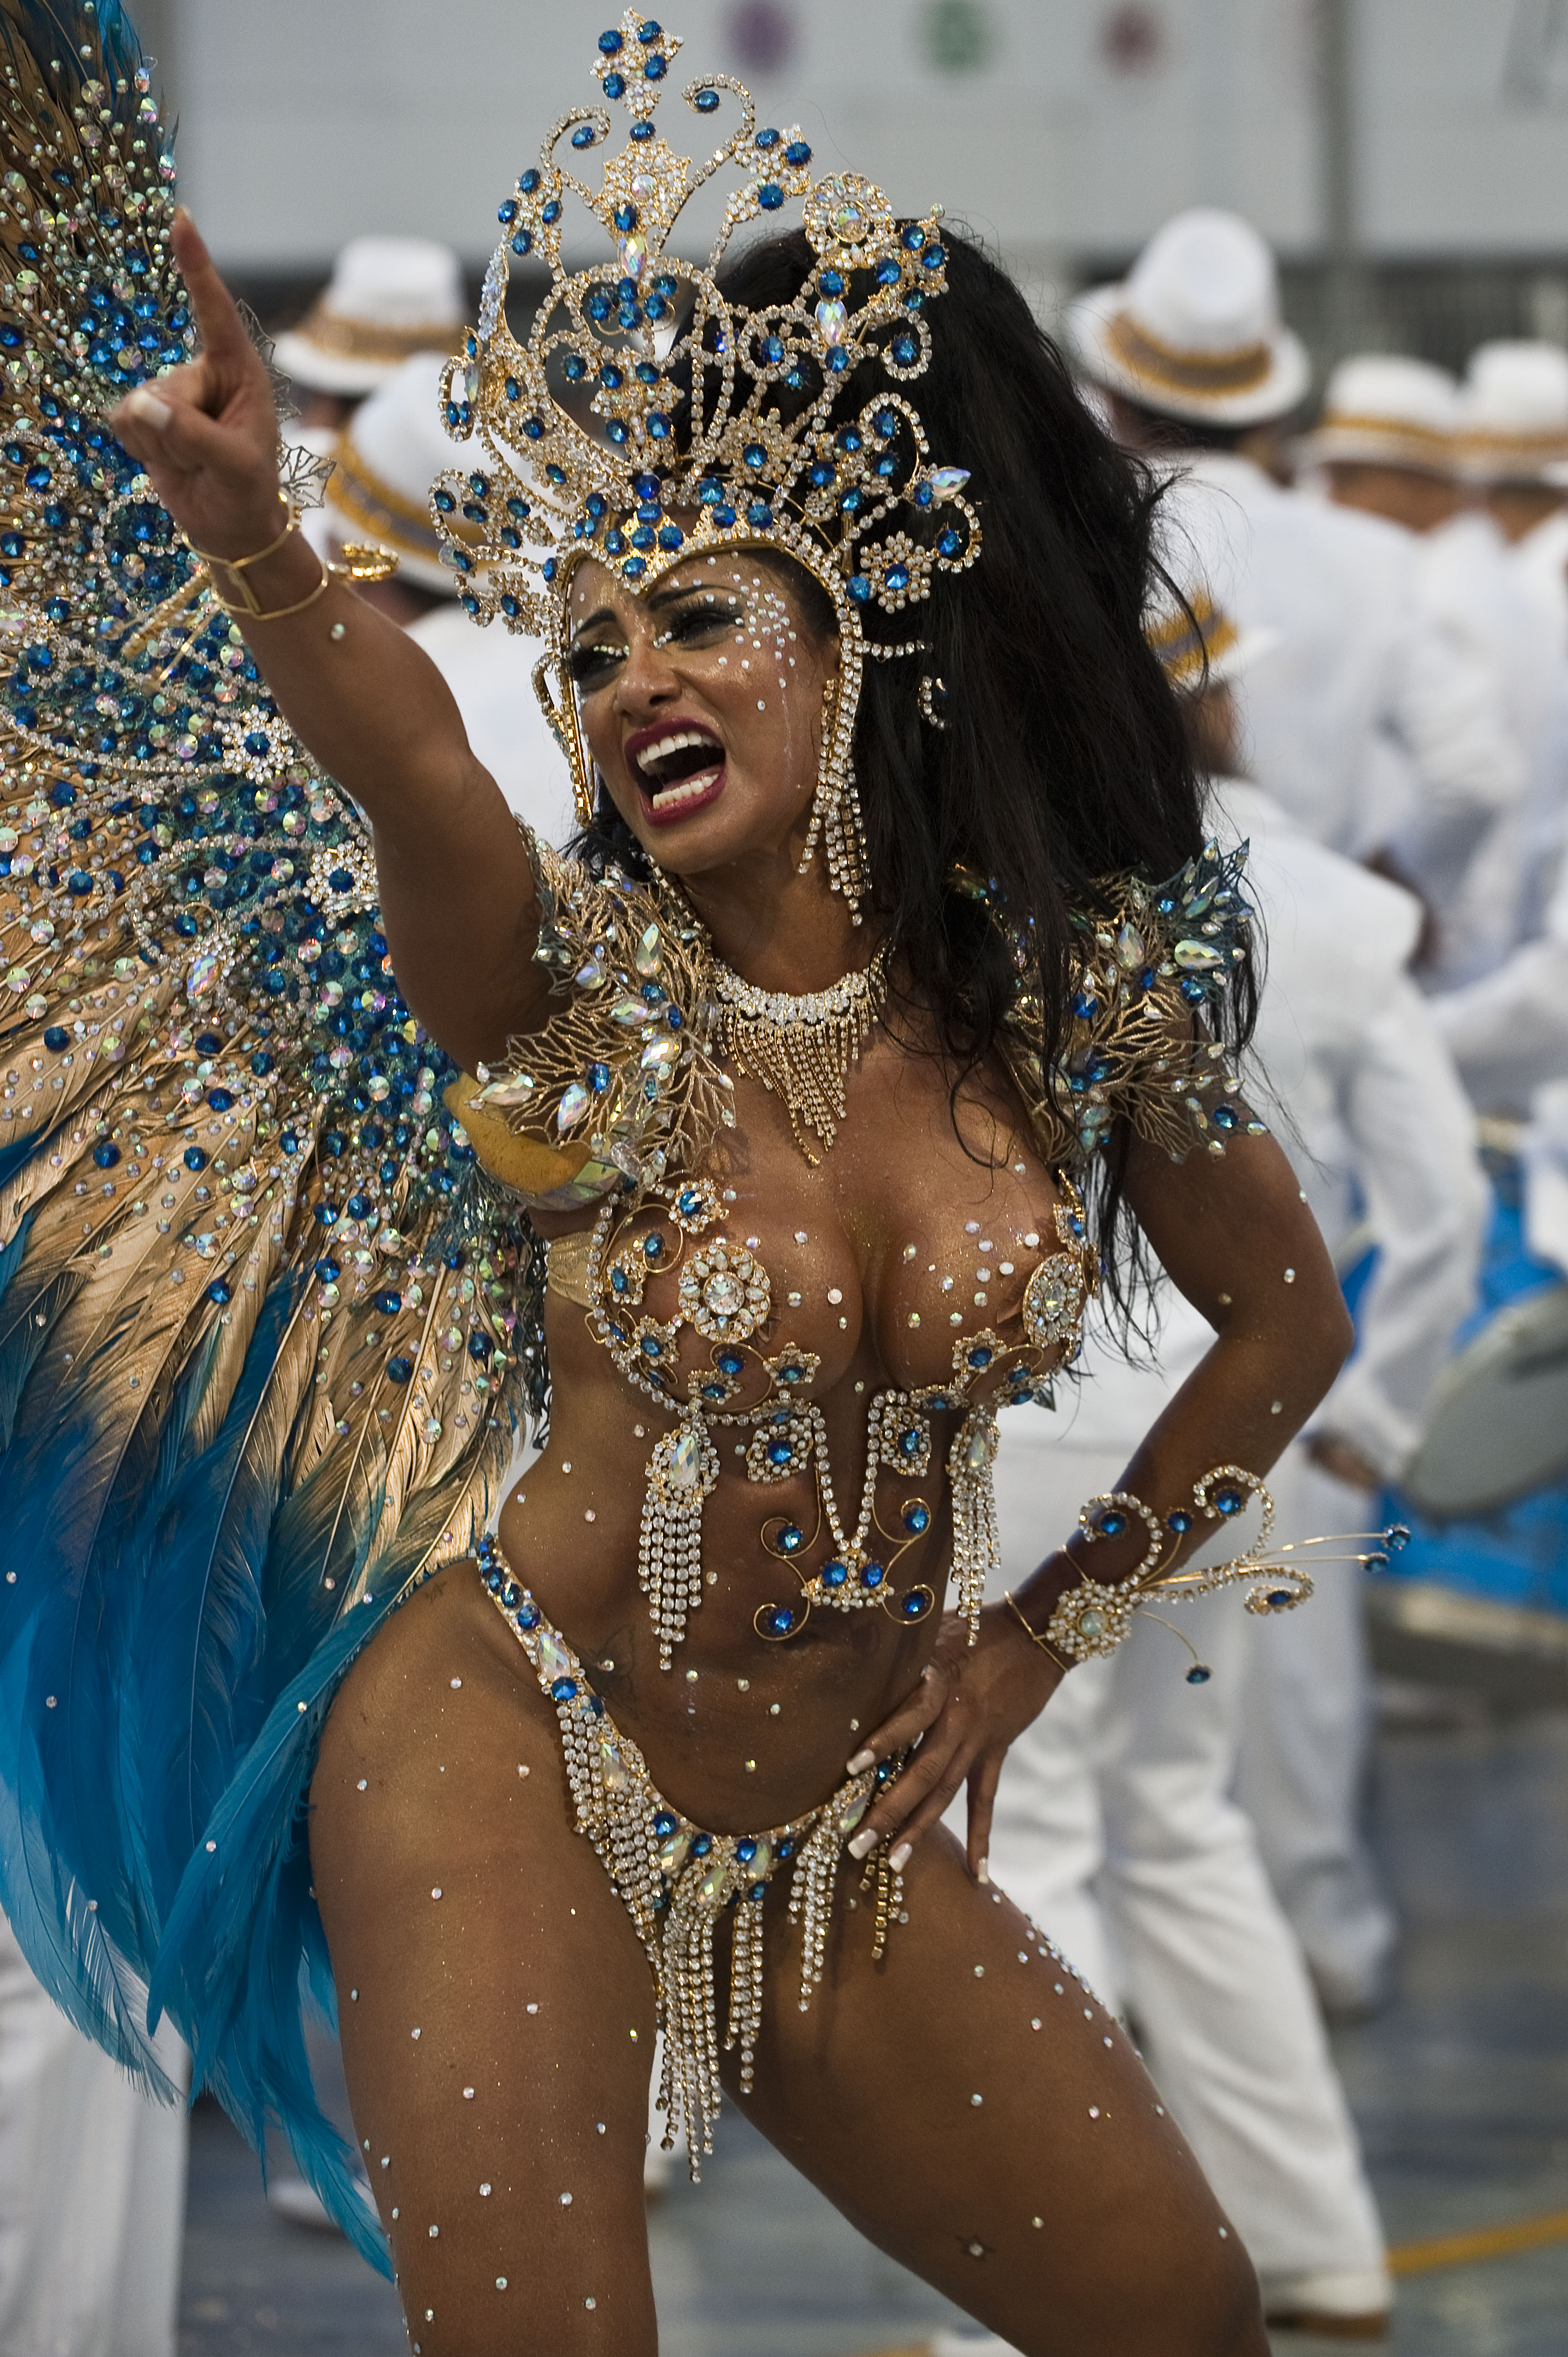 секс карнавал в рио-де-жанейро онлайн засмеялся, просунул